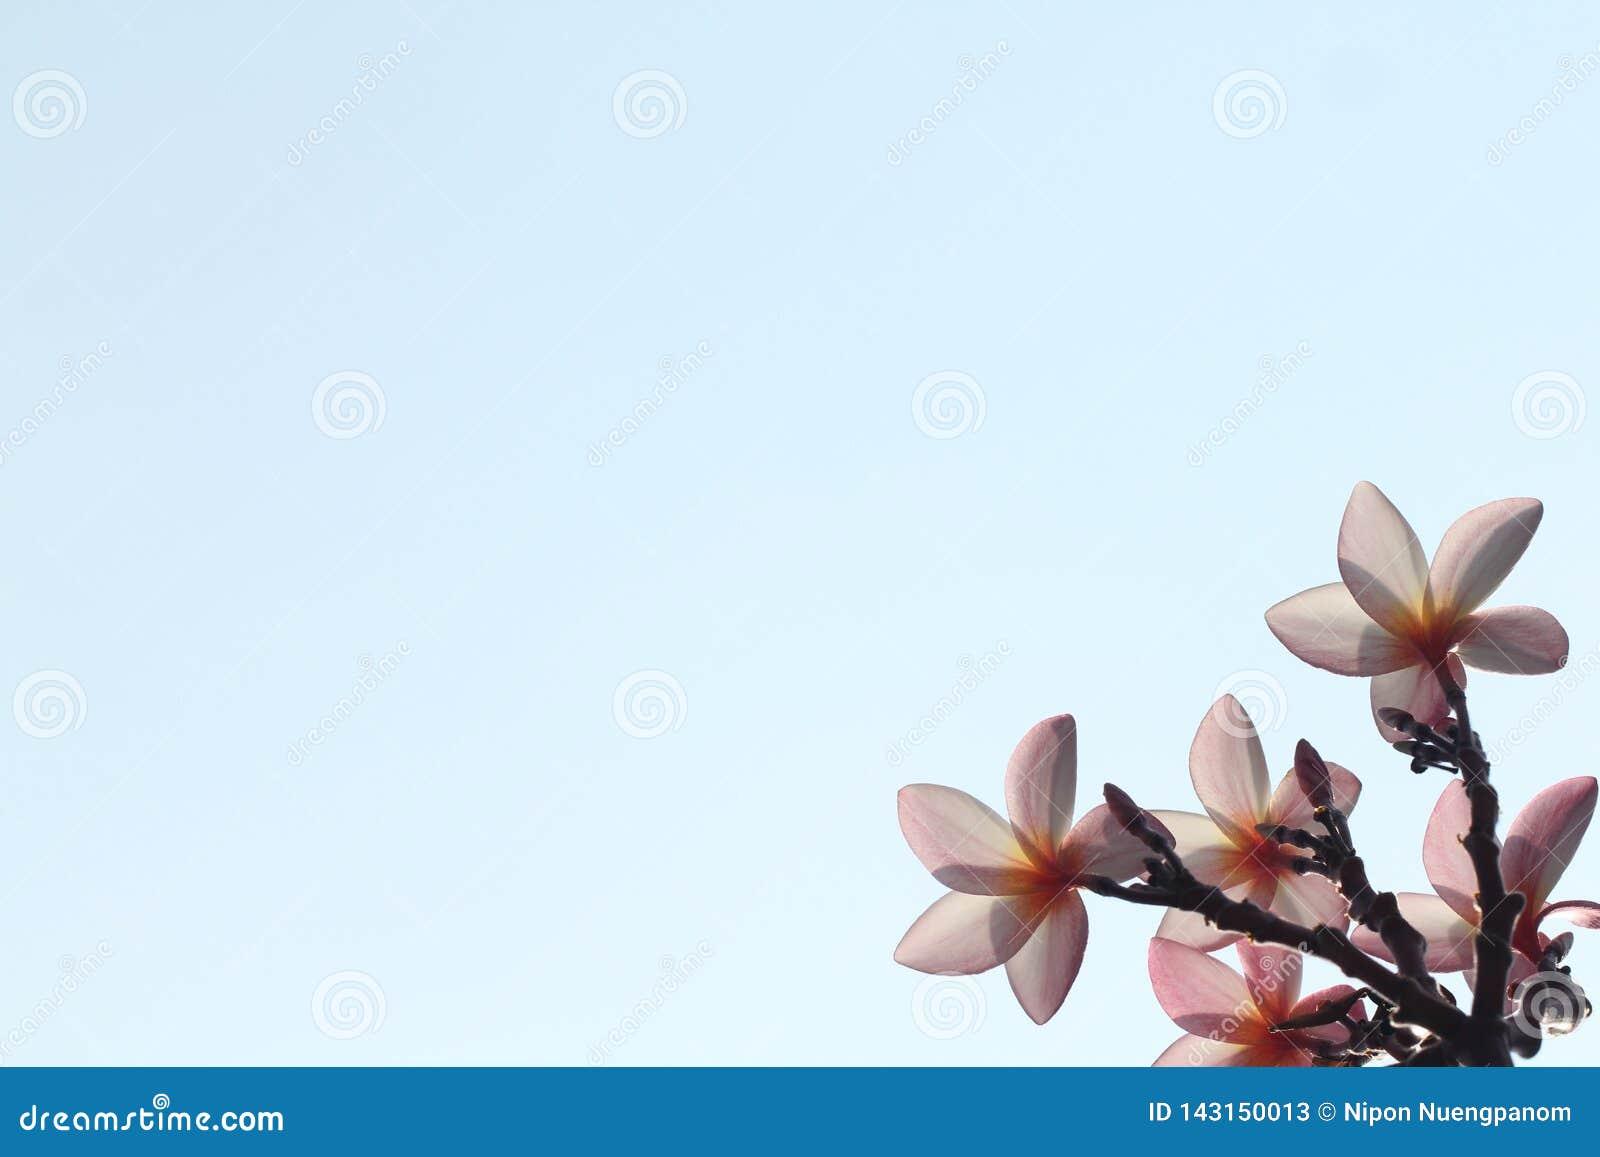 Задний взгляд со стороны розового цветка на предпосылке голубого неба без облака